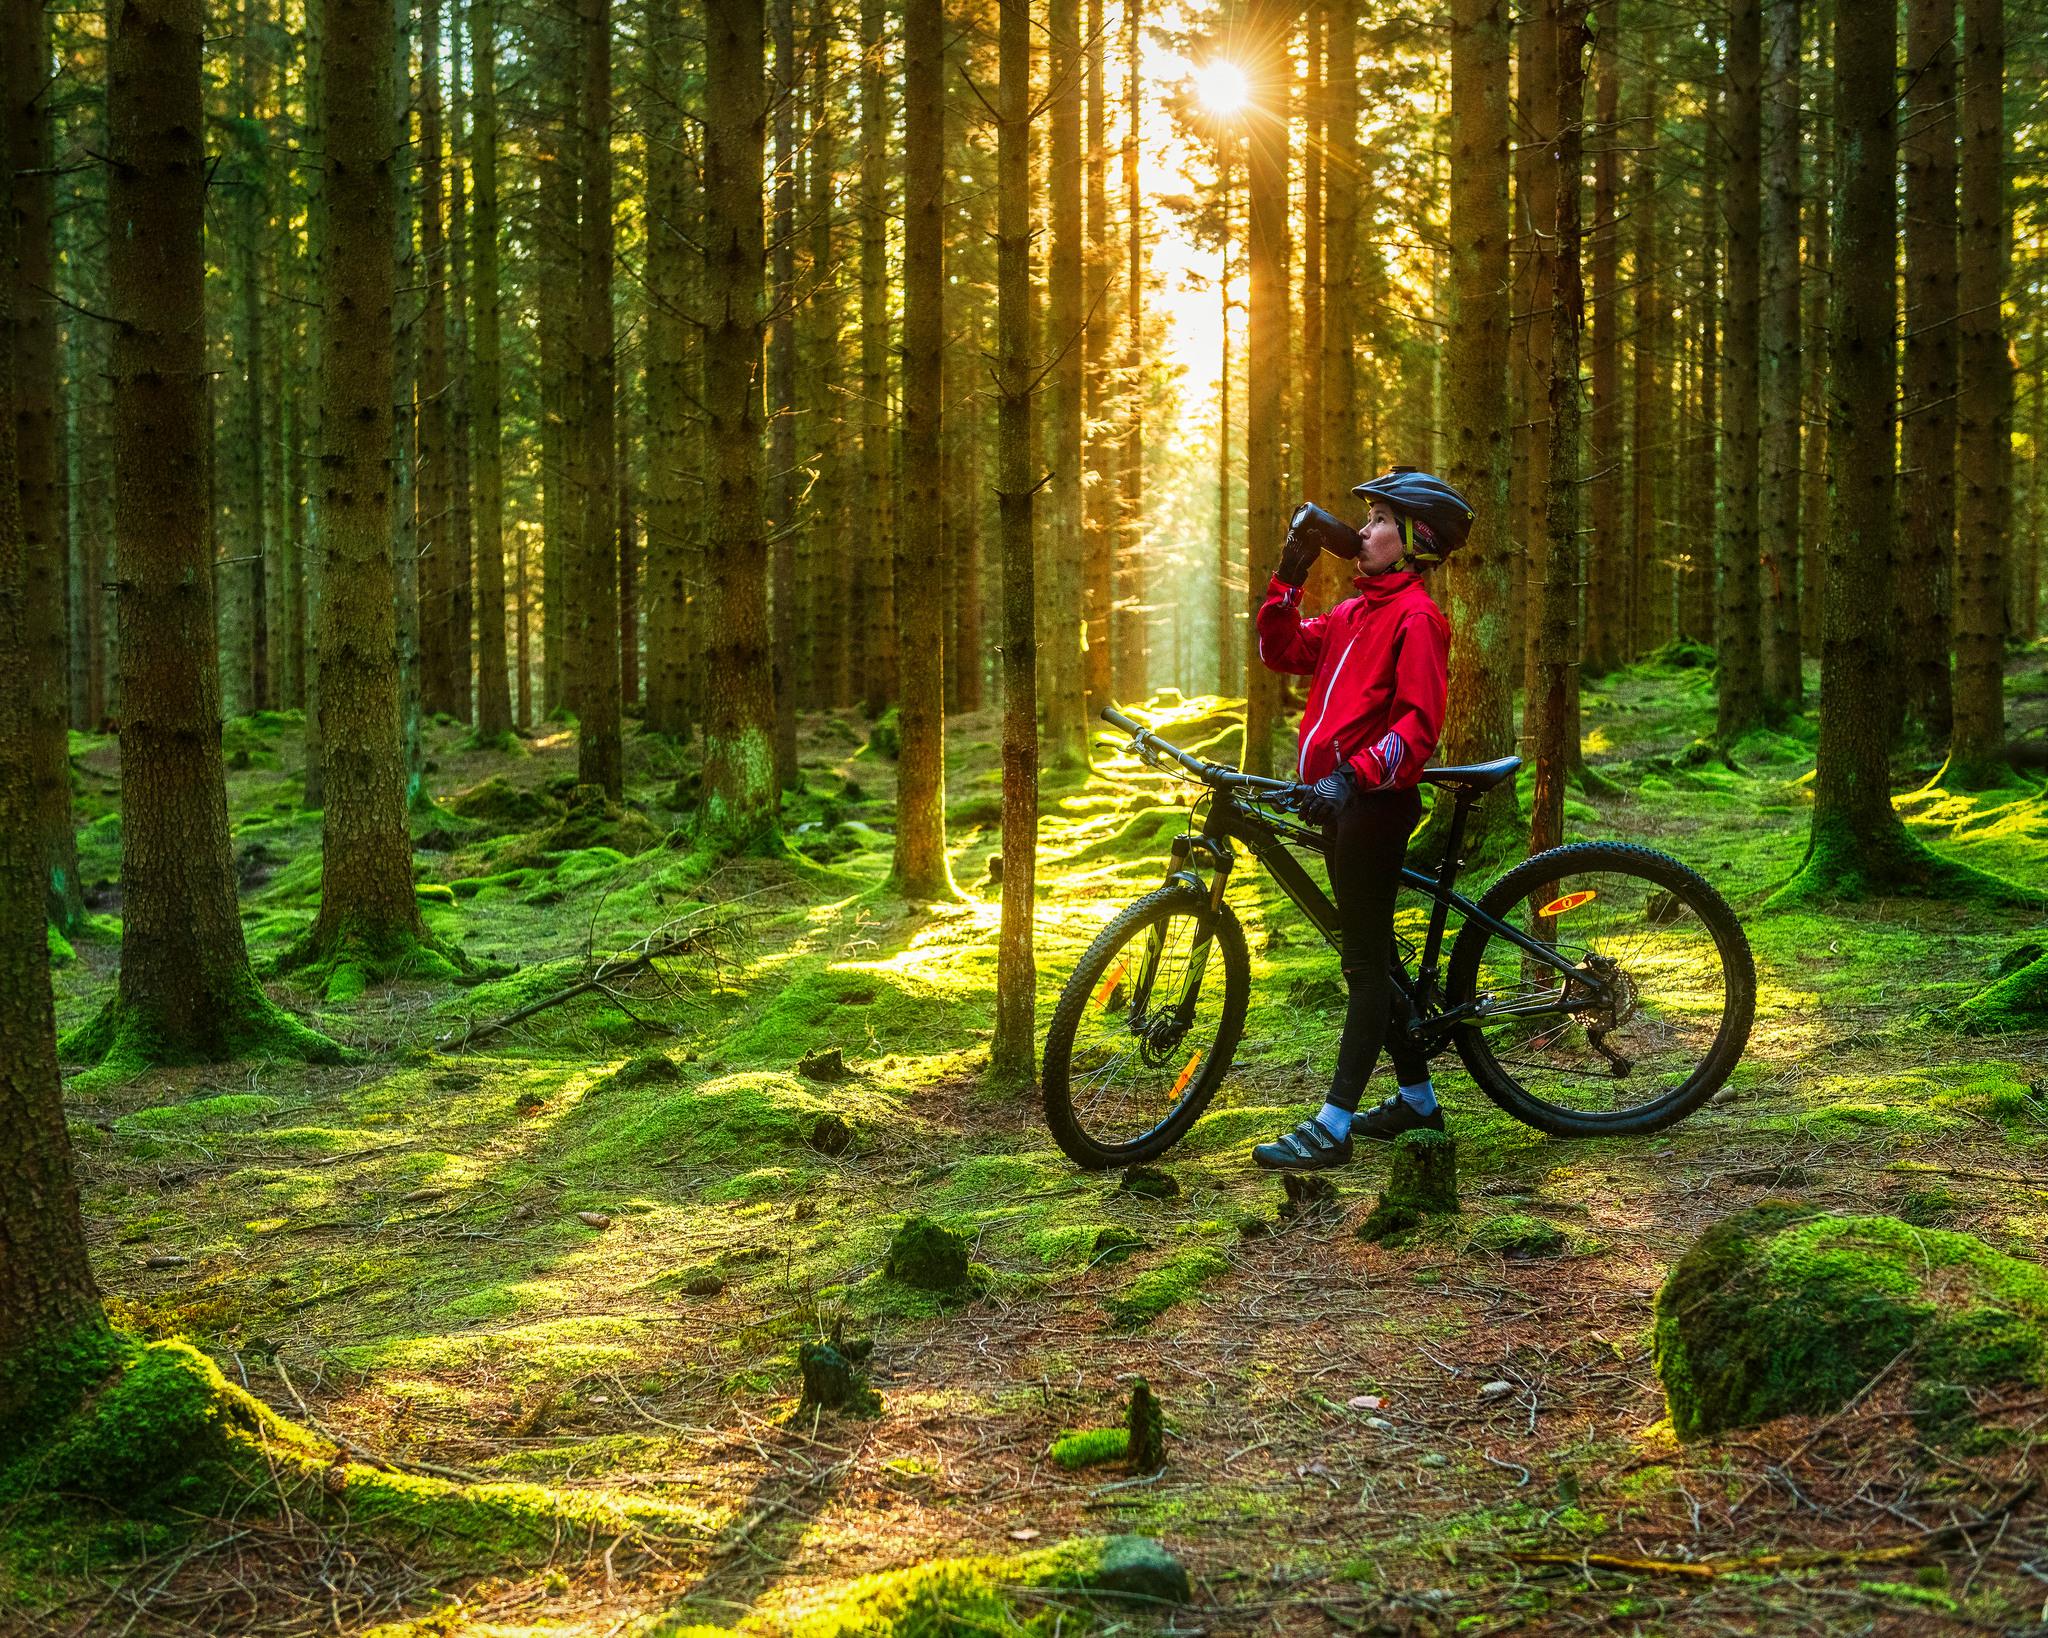 Kille som cyklar i skogen.